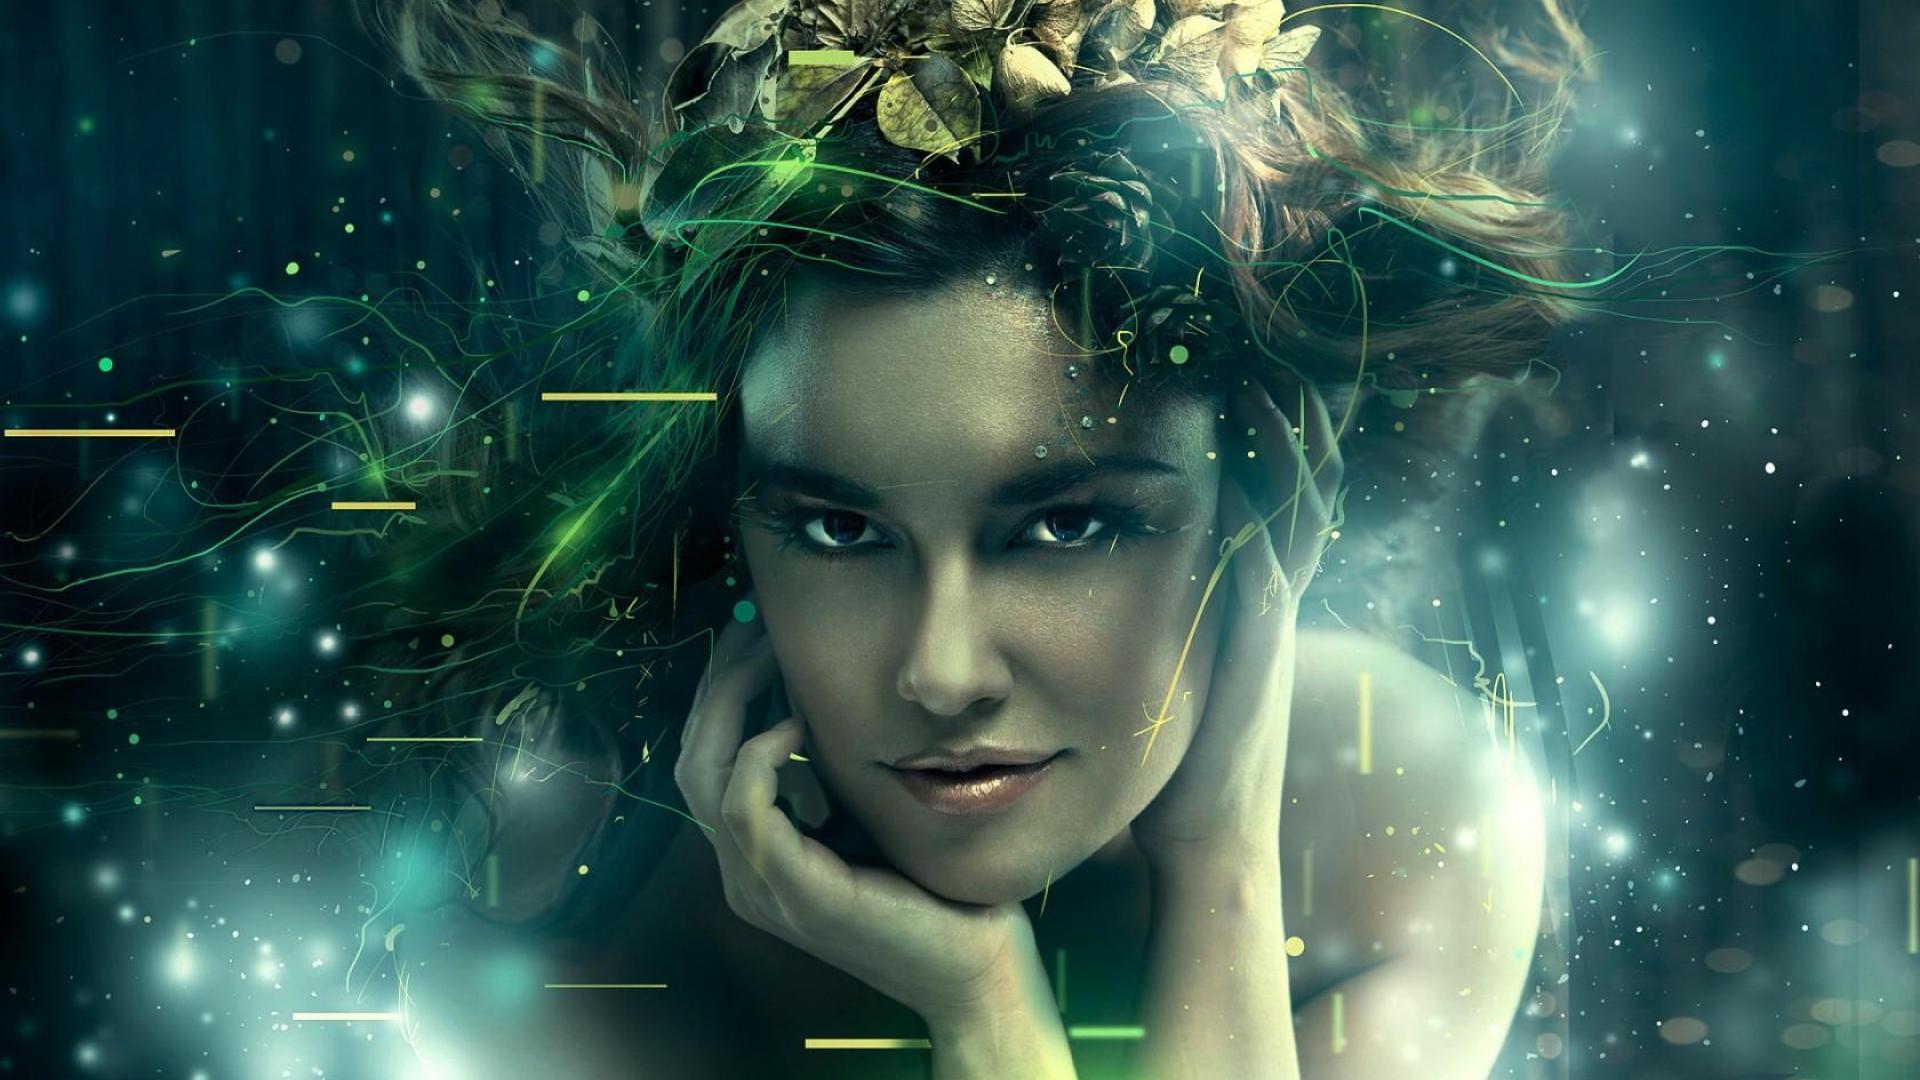 Magic Girl Women Fantasy HD Wallpaper   Stylish HD Wallpapers 1920x1080